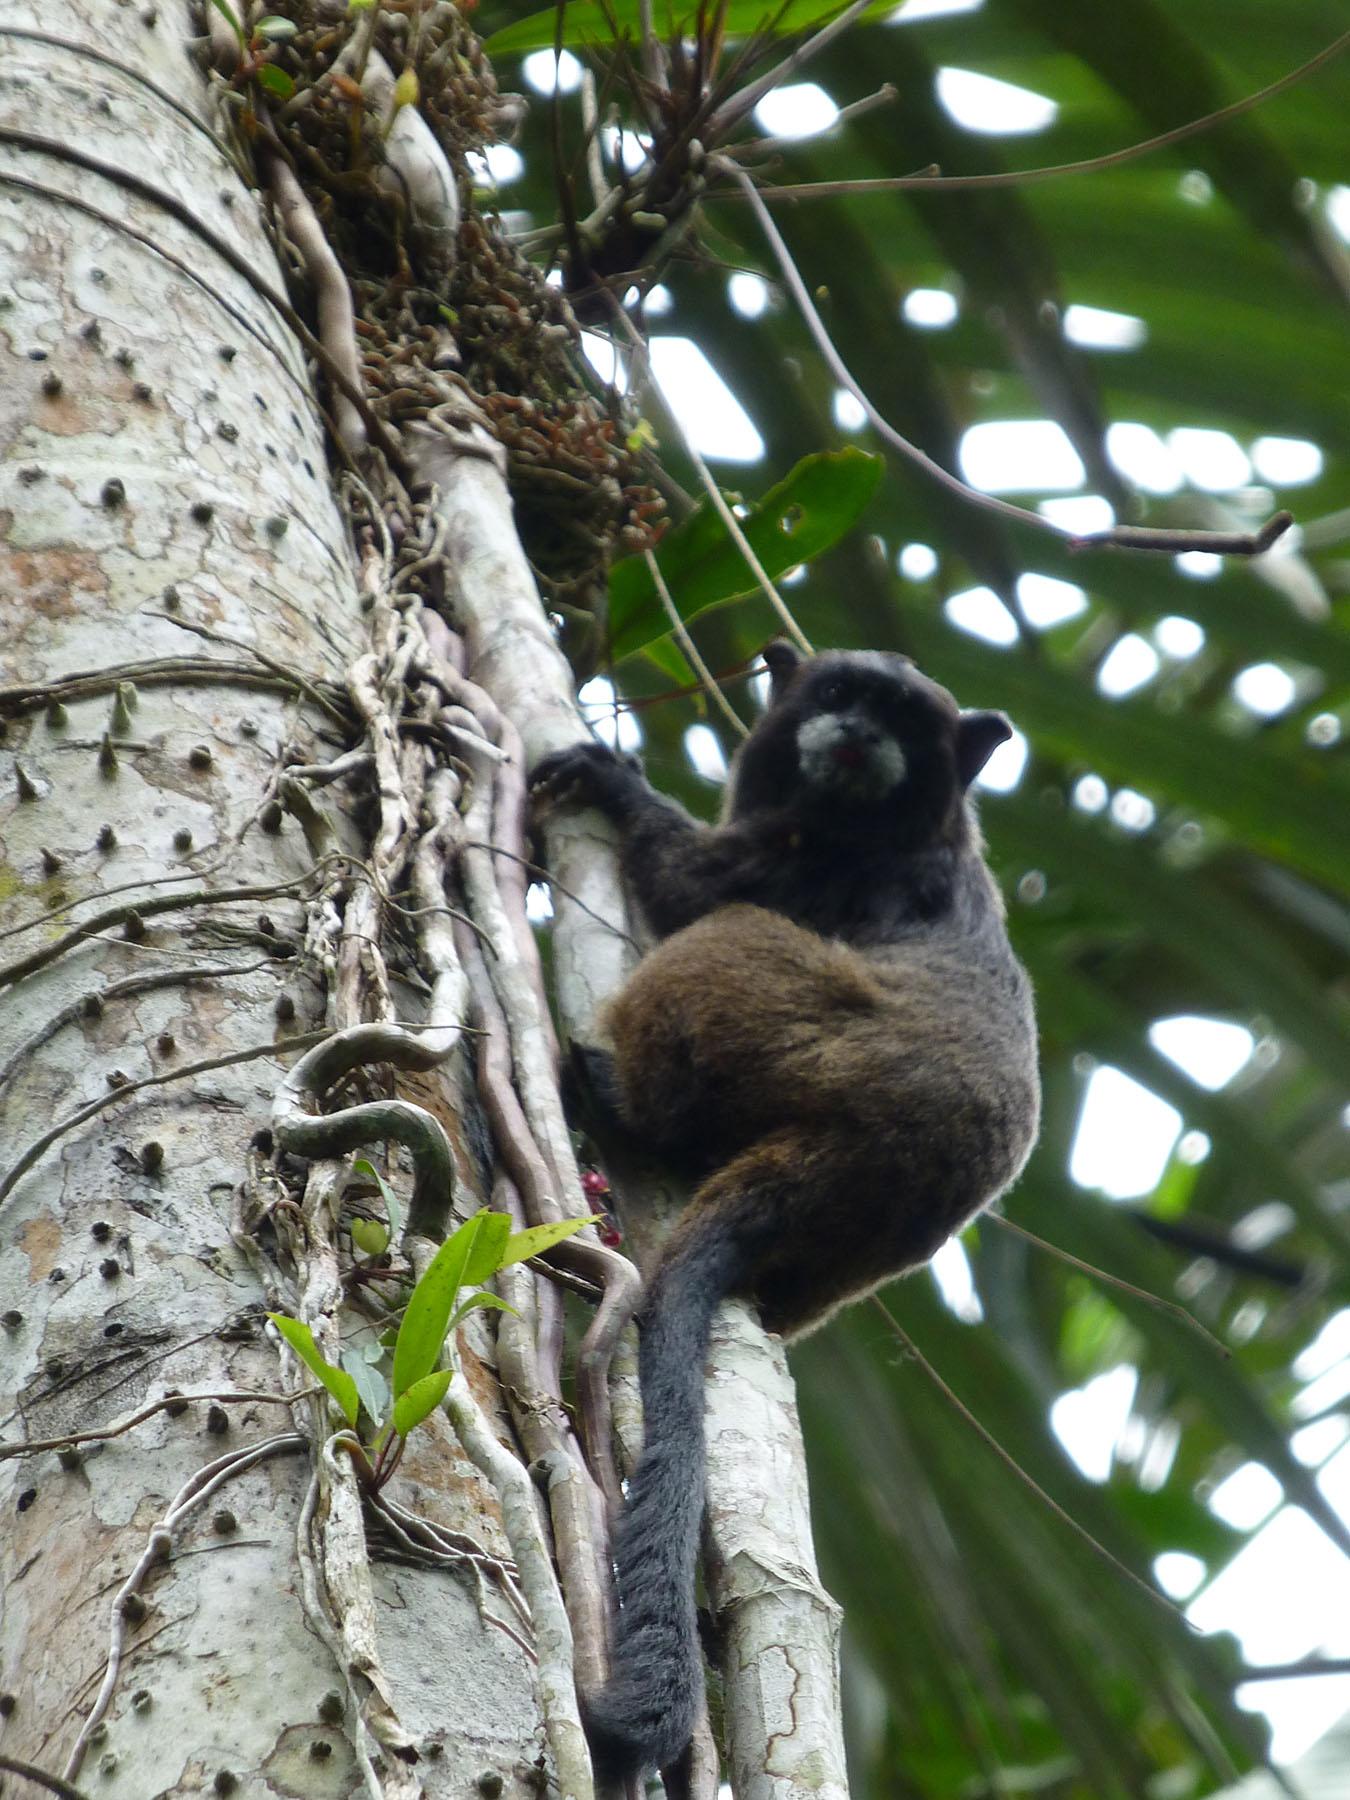 A black mantled tamarin monkey.